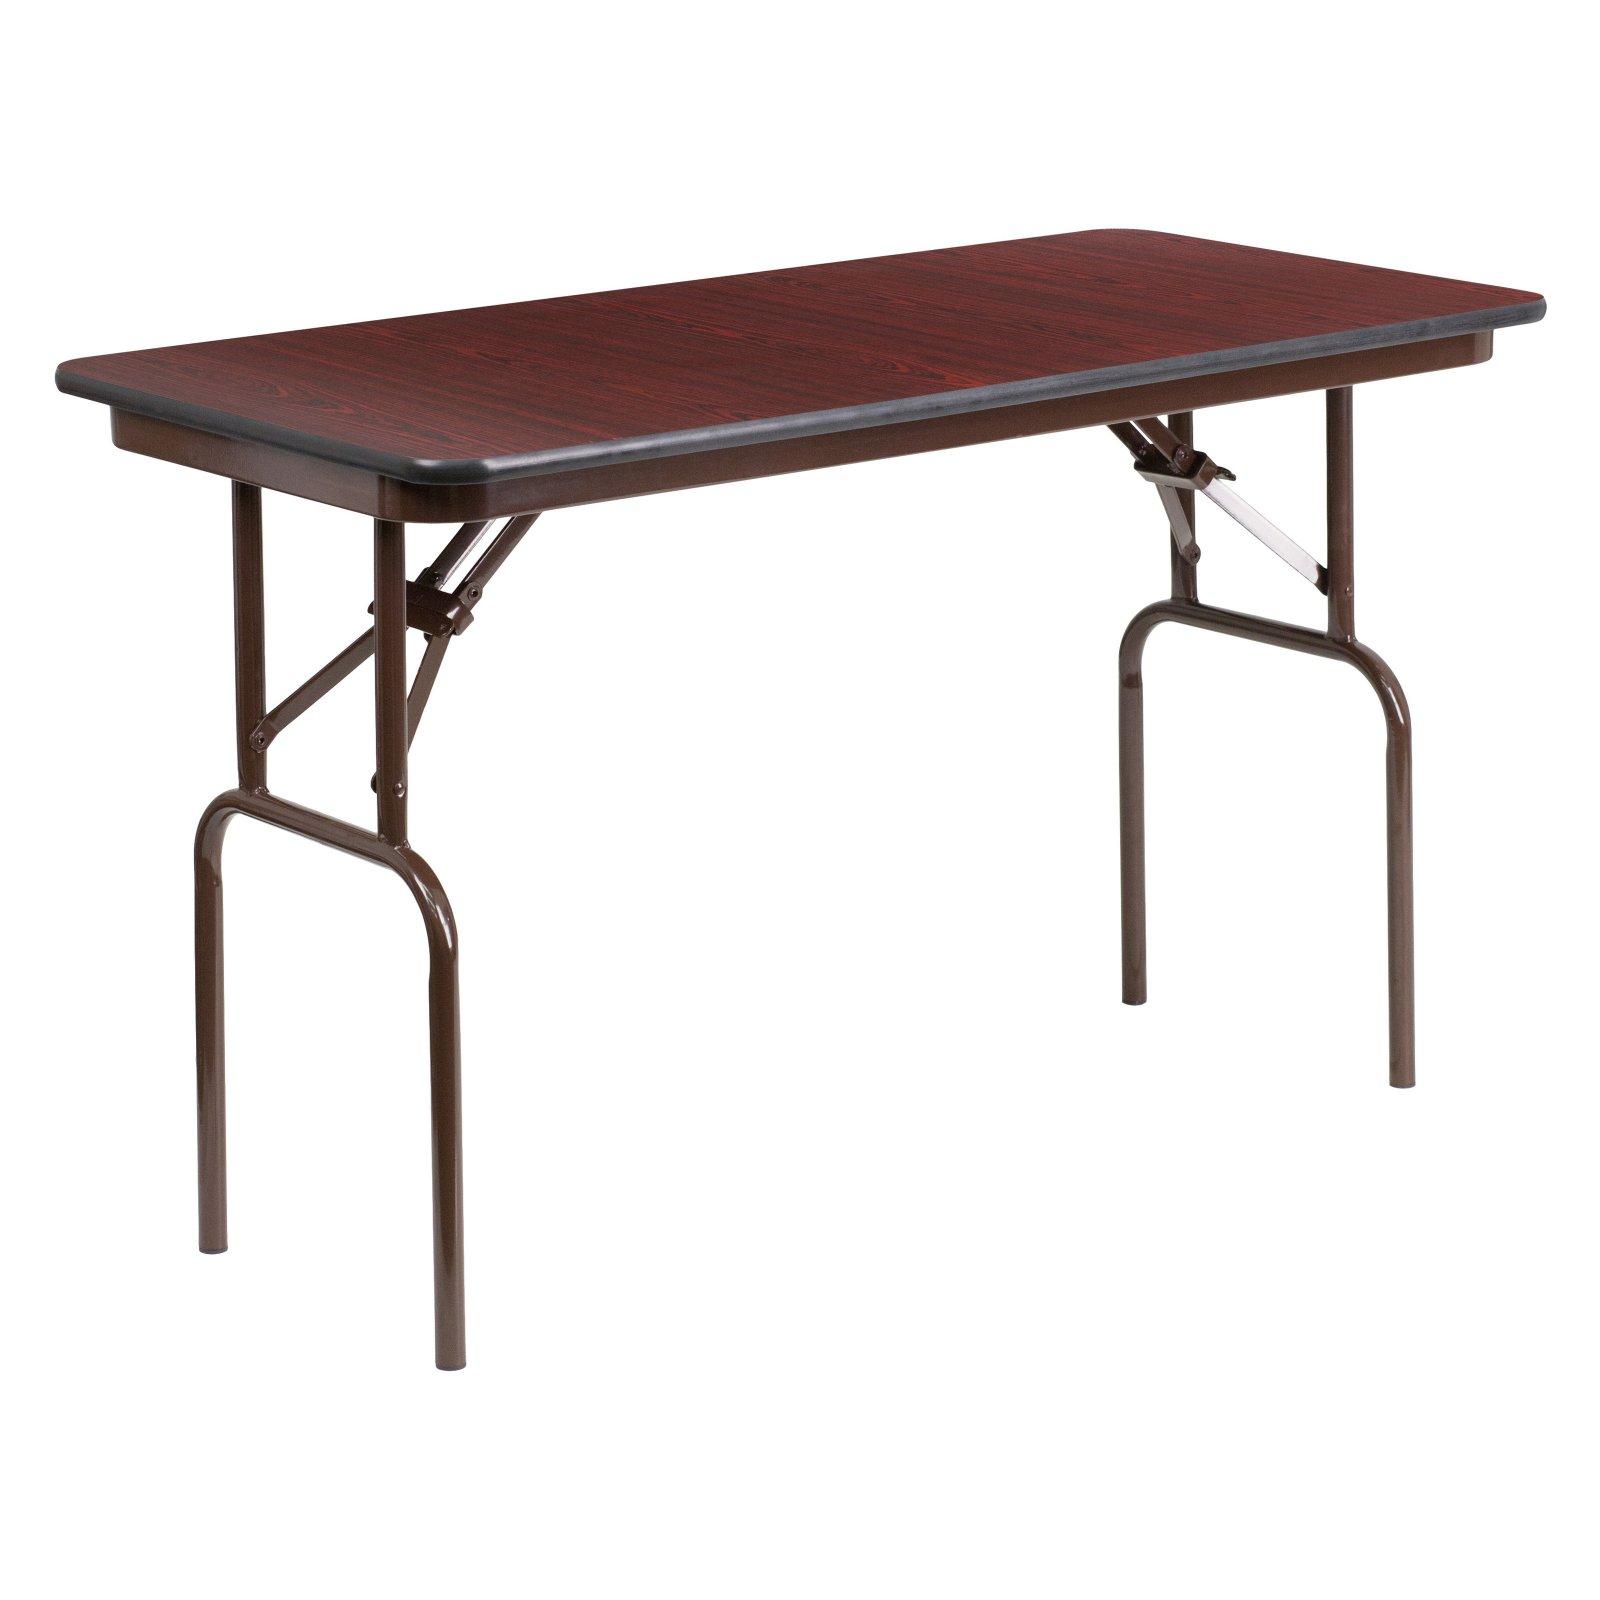 Standard Height Adjustable Legs 24 W x 48 D x 21.125-30.125 H 24 W x 48 L Rectangular Oak Thermal Laminate Activity Table